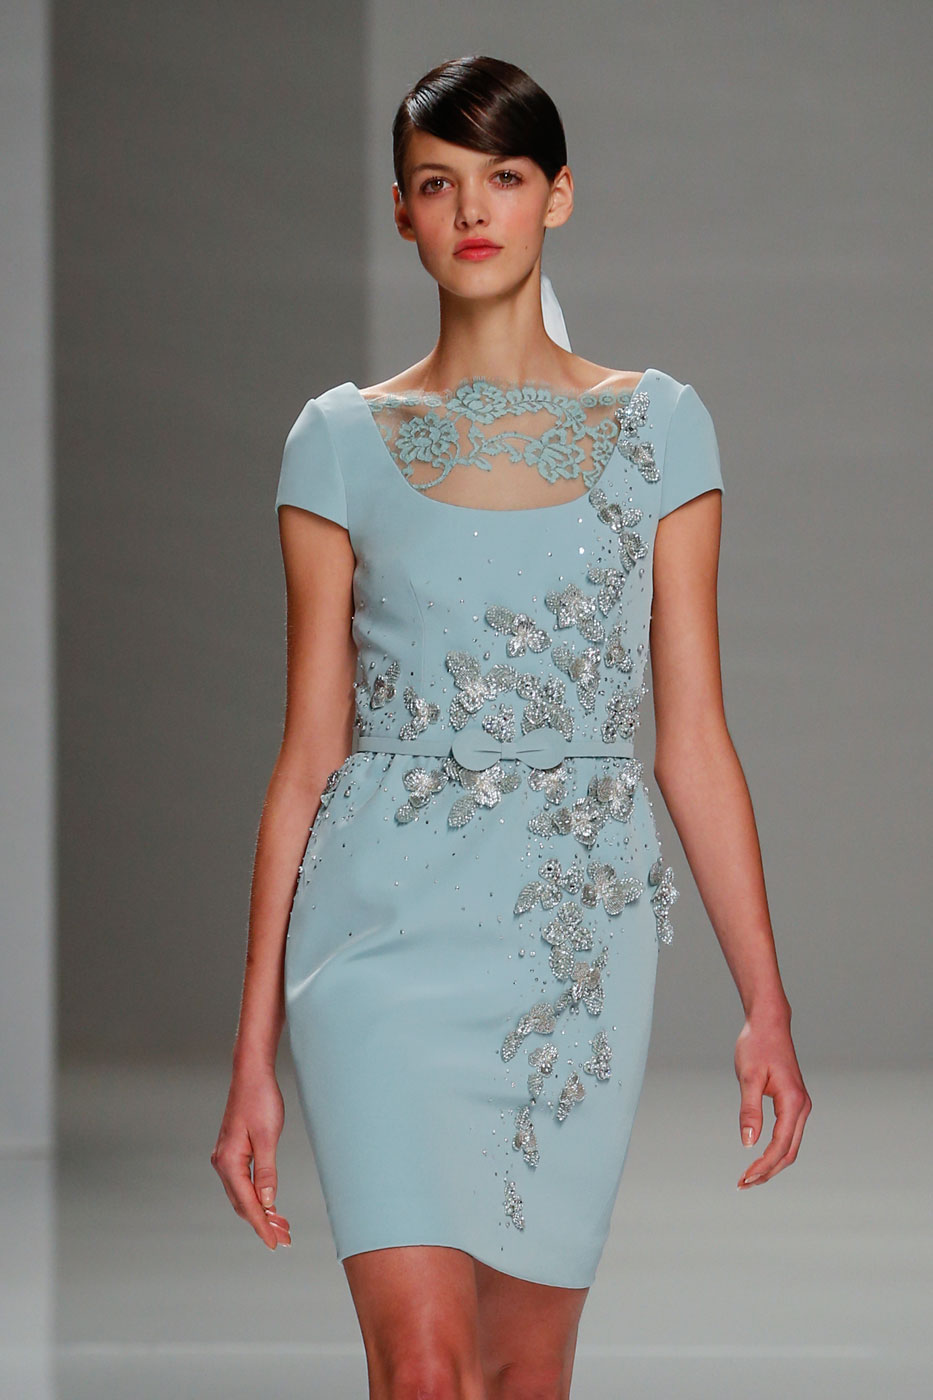 Georges-Hobeika-fashion-runway-show-haute-couture-paris-spring-2015-the-impression-28